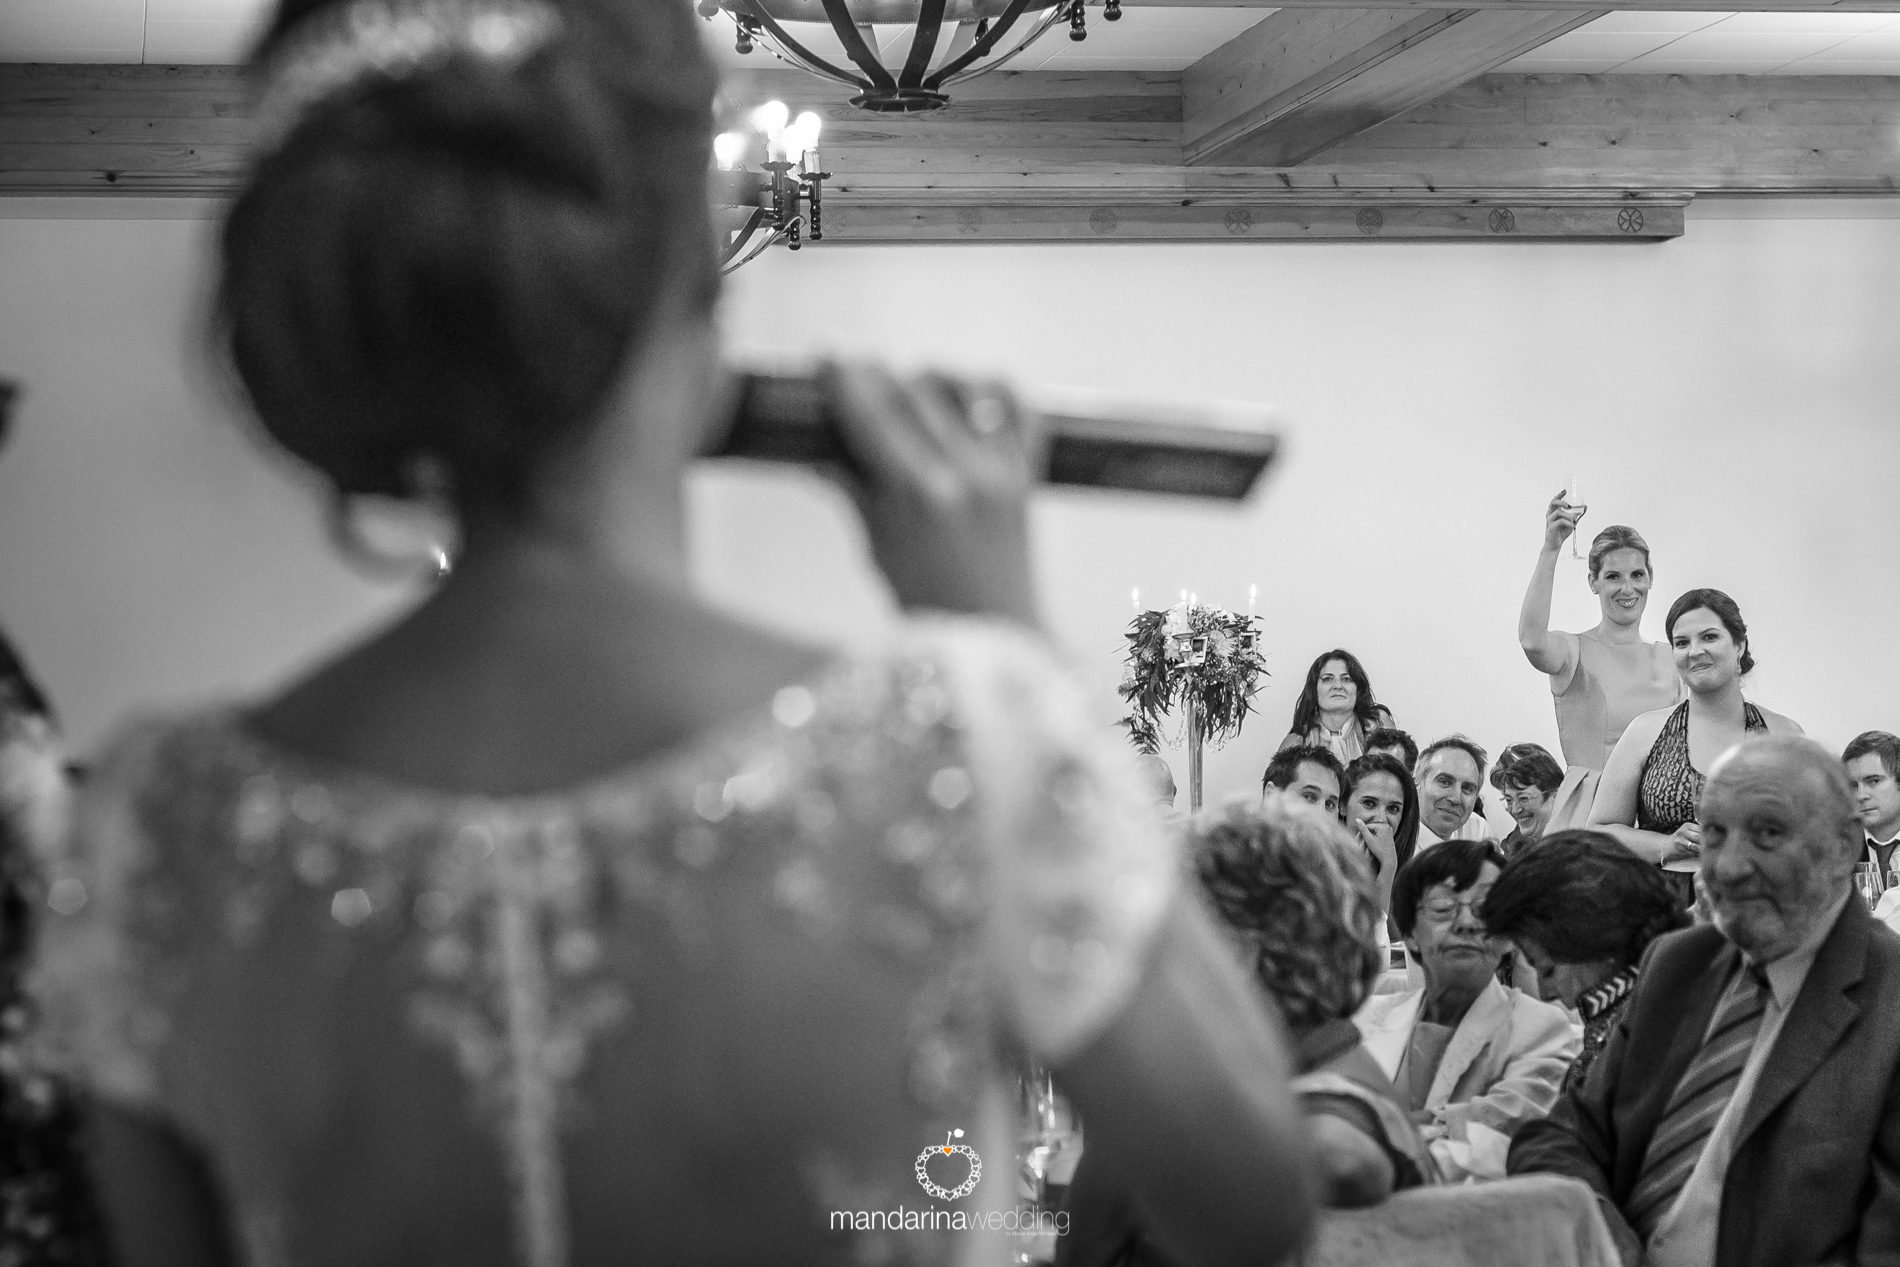 mandaria wedding, fotografos de boda, fotoperiodismo de boda, mejores fotografos de boda, bodas soria, bodas pirineo, bodas Madrid, fotógrafos tarragona_14